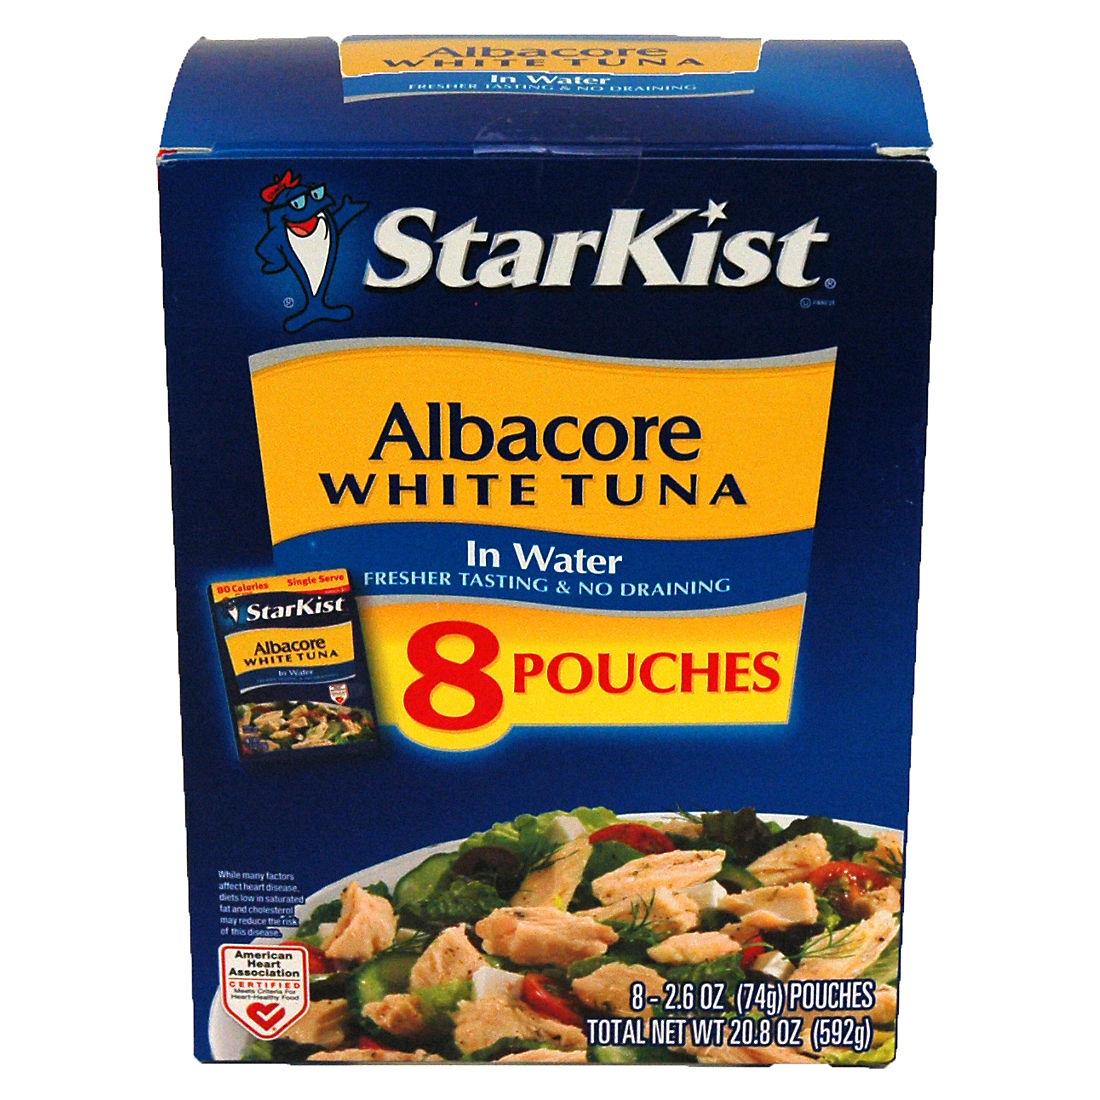 Starkist Albacore Tuna in Water Pouches